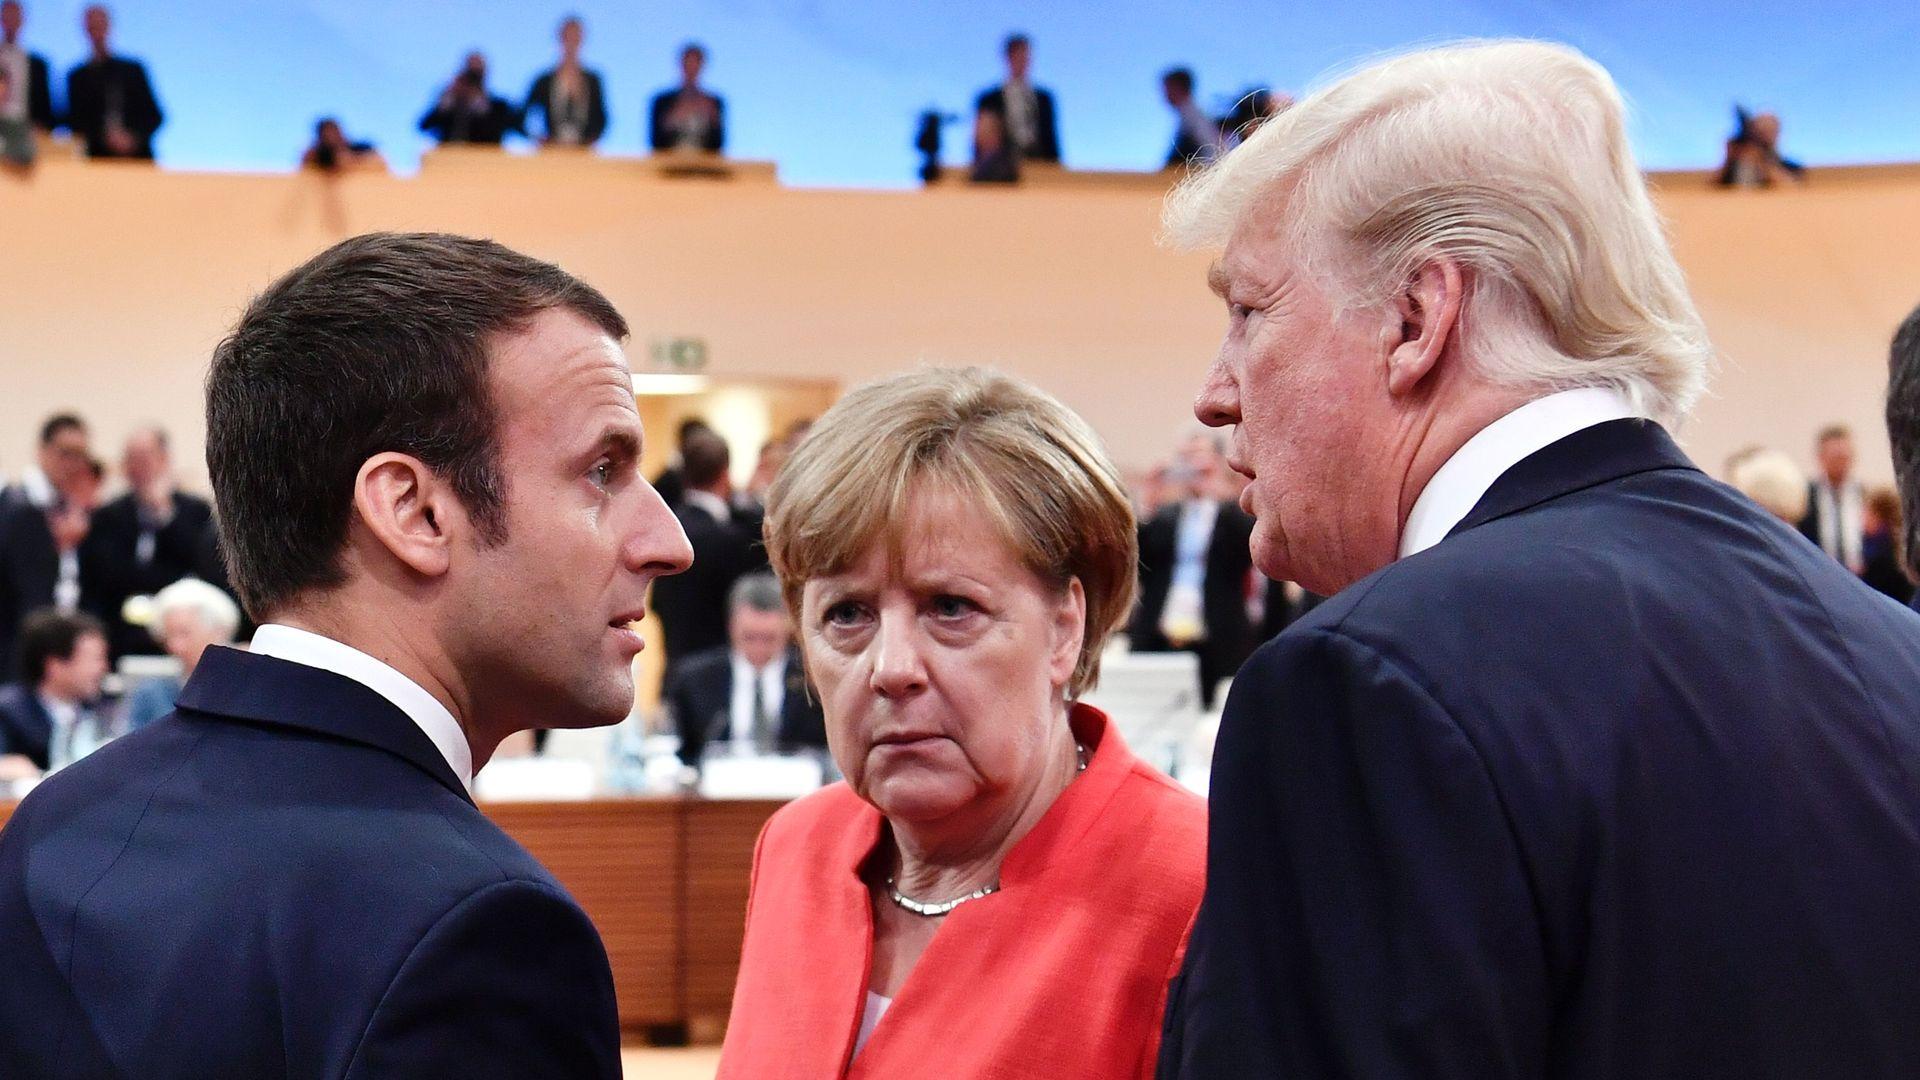 Macron, Merkel and Trump